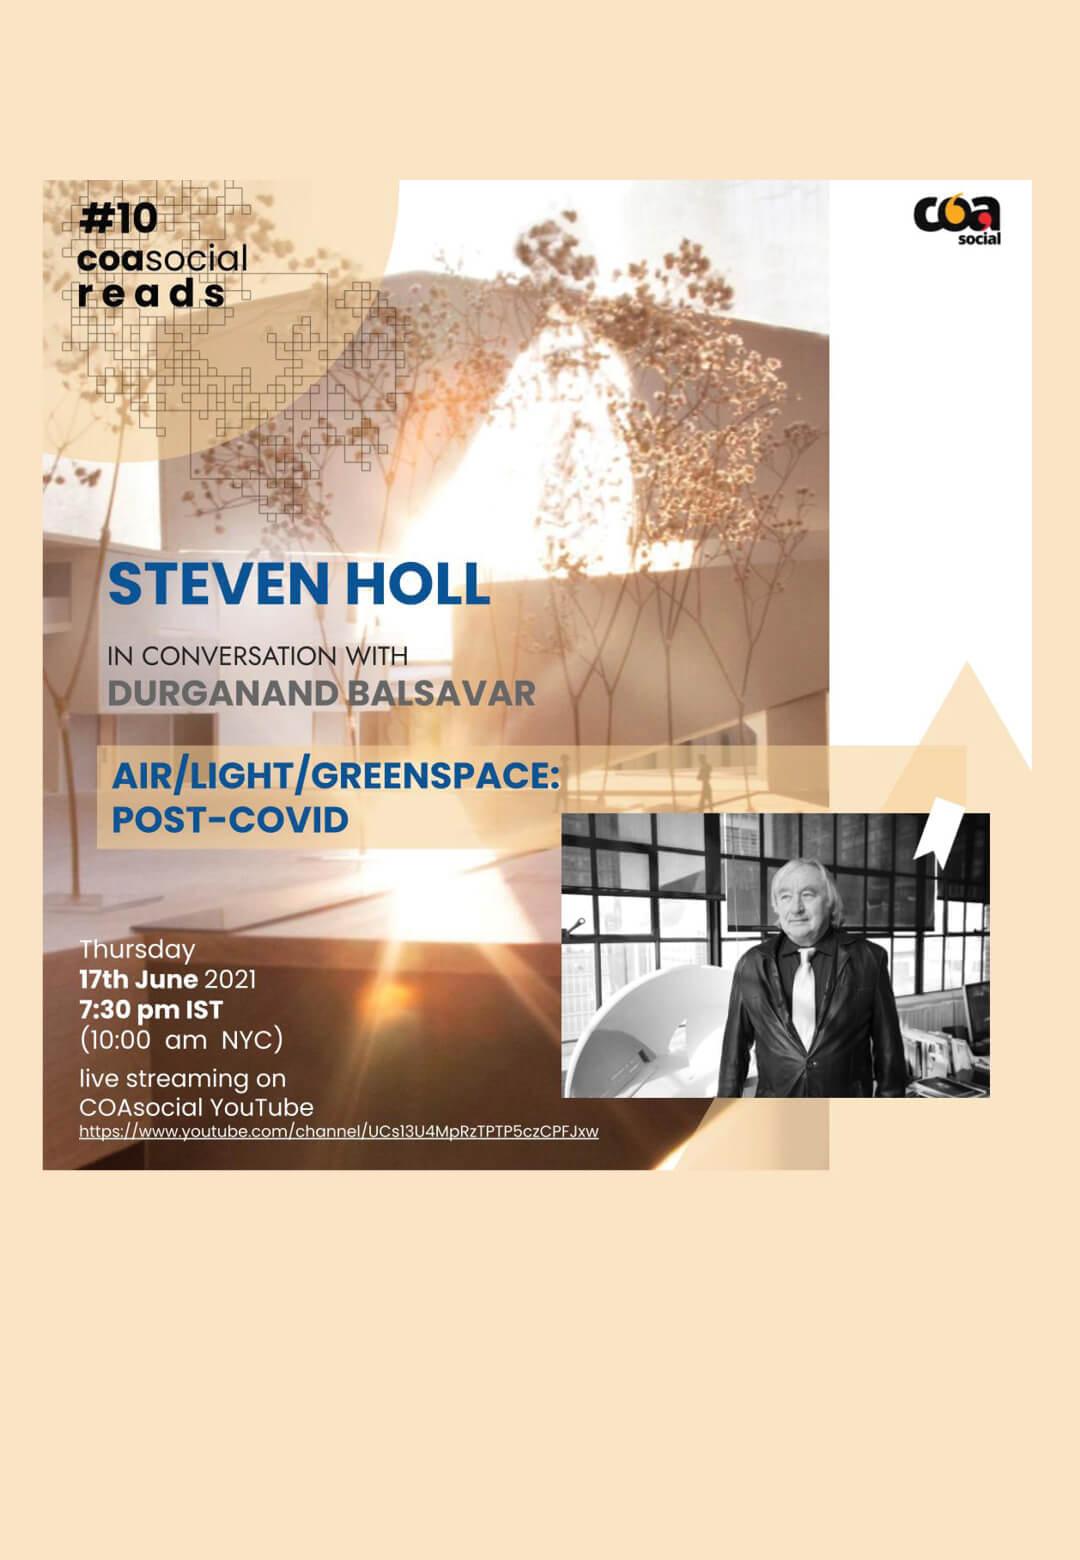 COASocial Reads - Steven Holl in conversation with Durganand Balsavar | COASocial Reads | Steven Holl and Durganand Balsavar | STIRworld